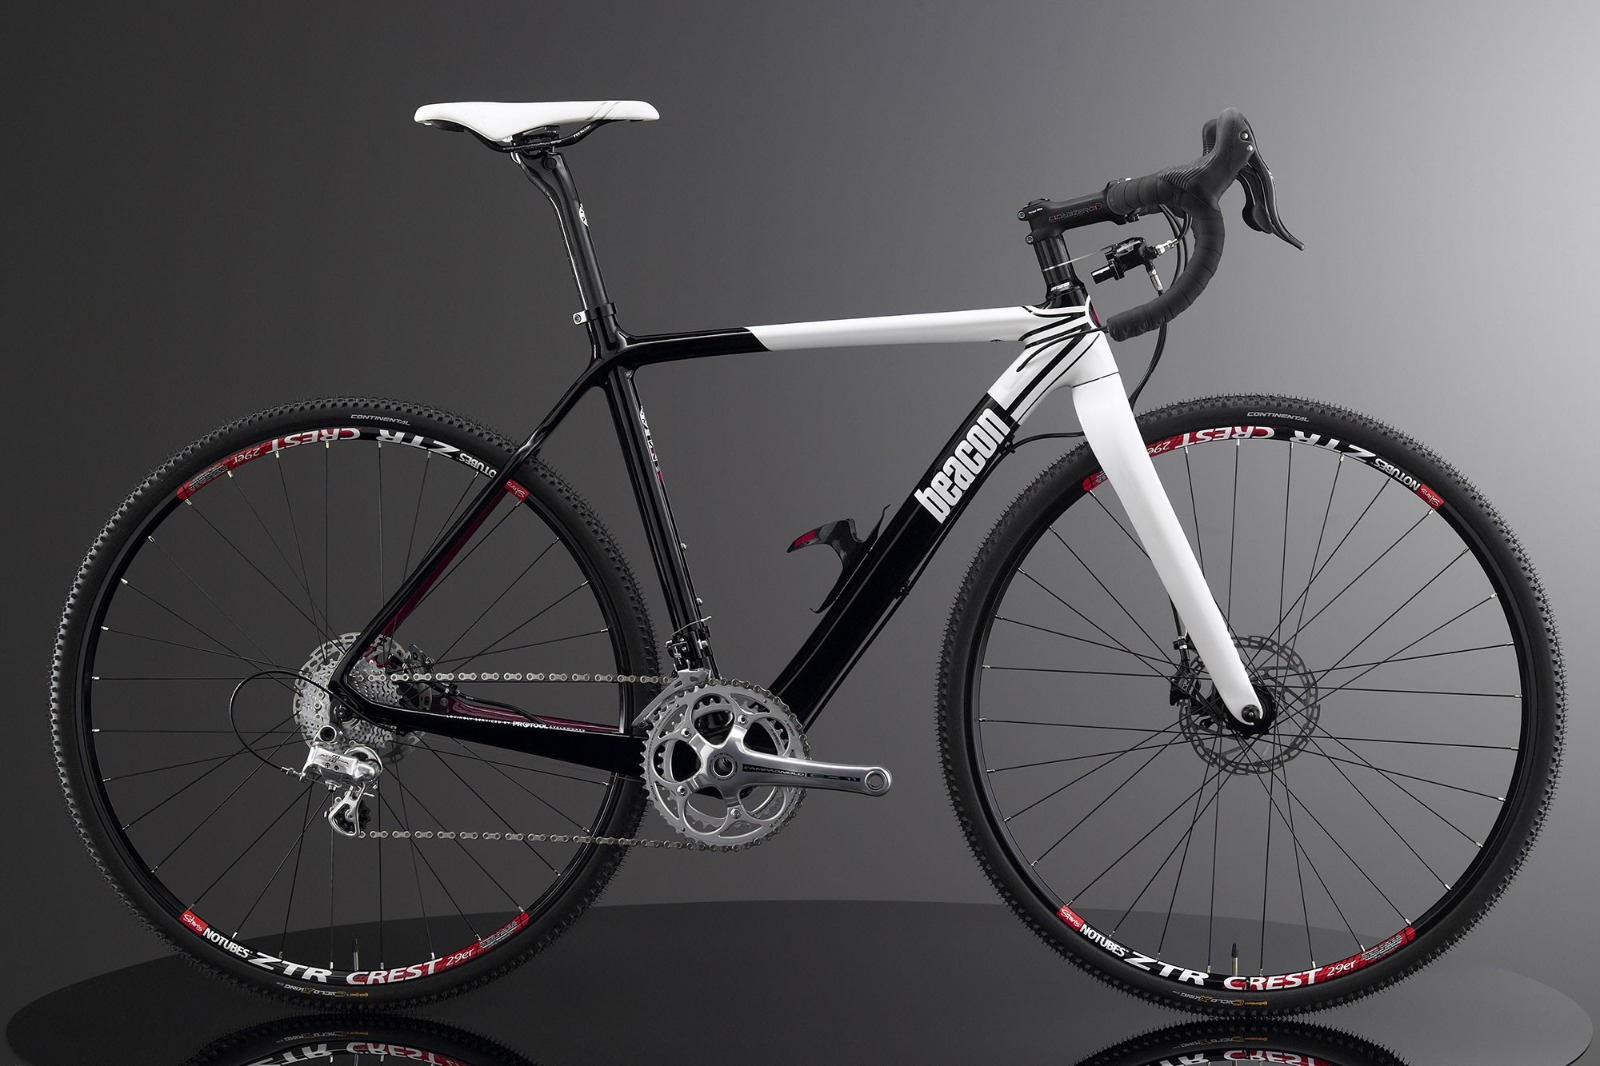 1 x Beacon Model BF-45, Size 580, Carbon Fibre Bike Frame in Black & White. - Image 2 of 3